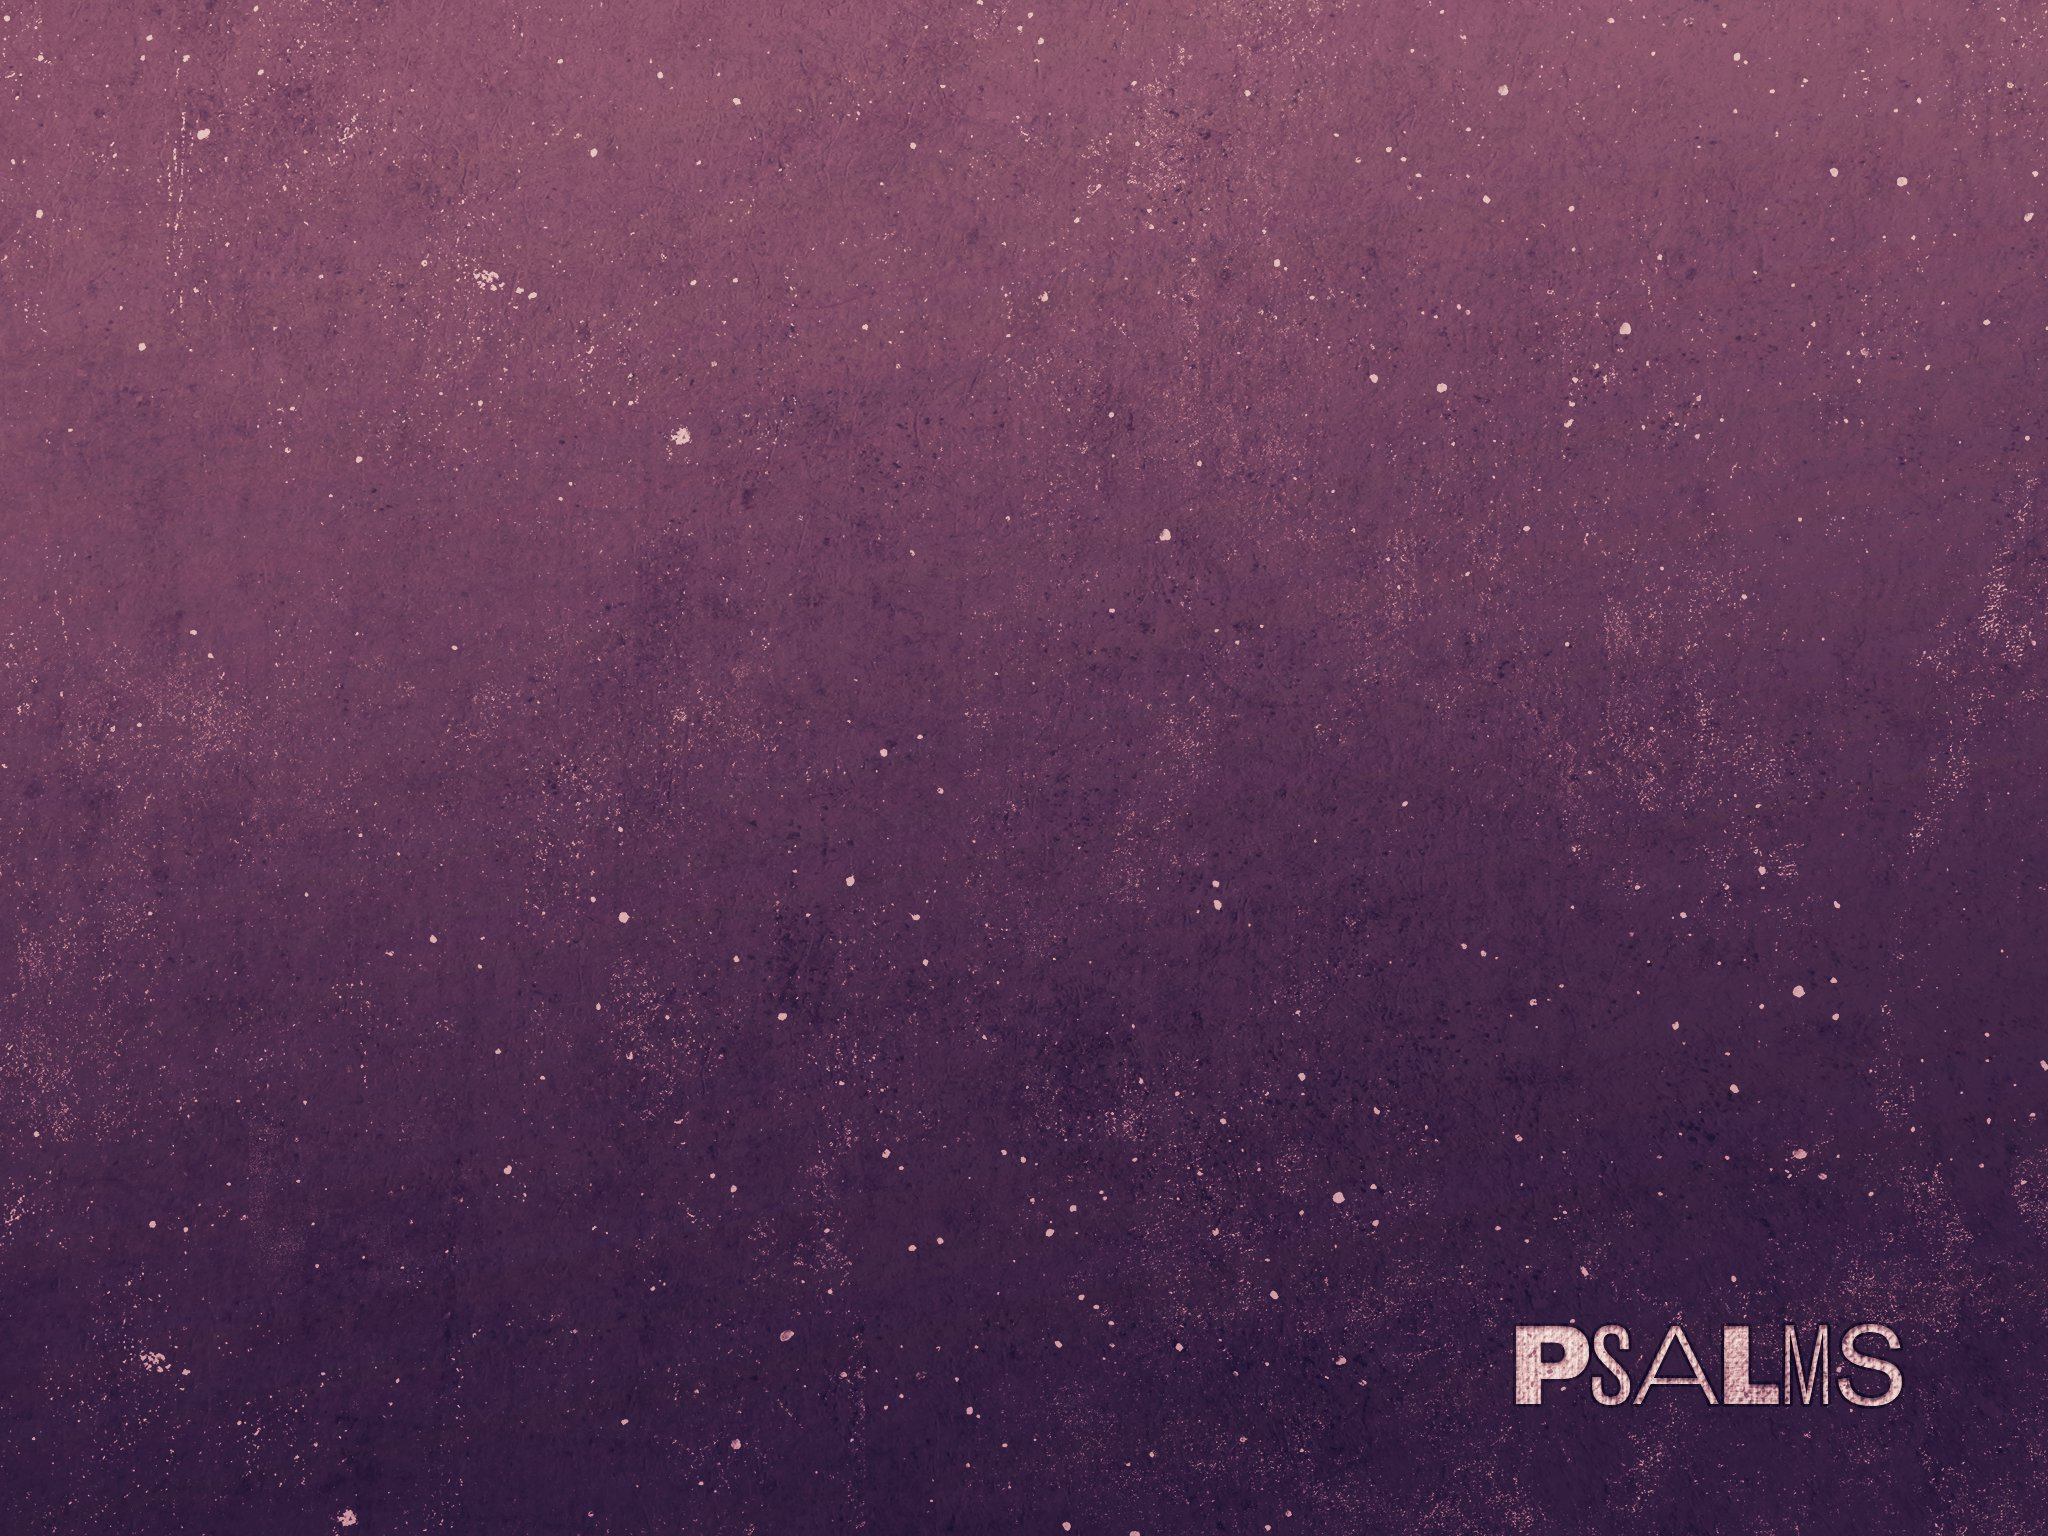 19-Psalms_Secondary_4x3-fullscreen.jpg